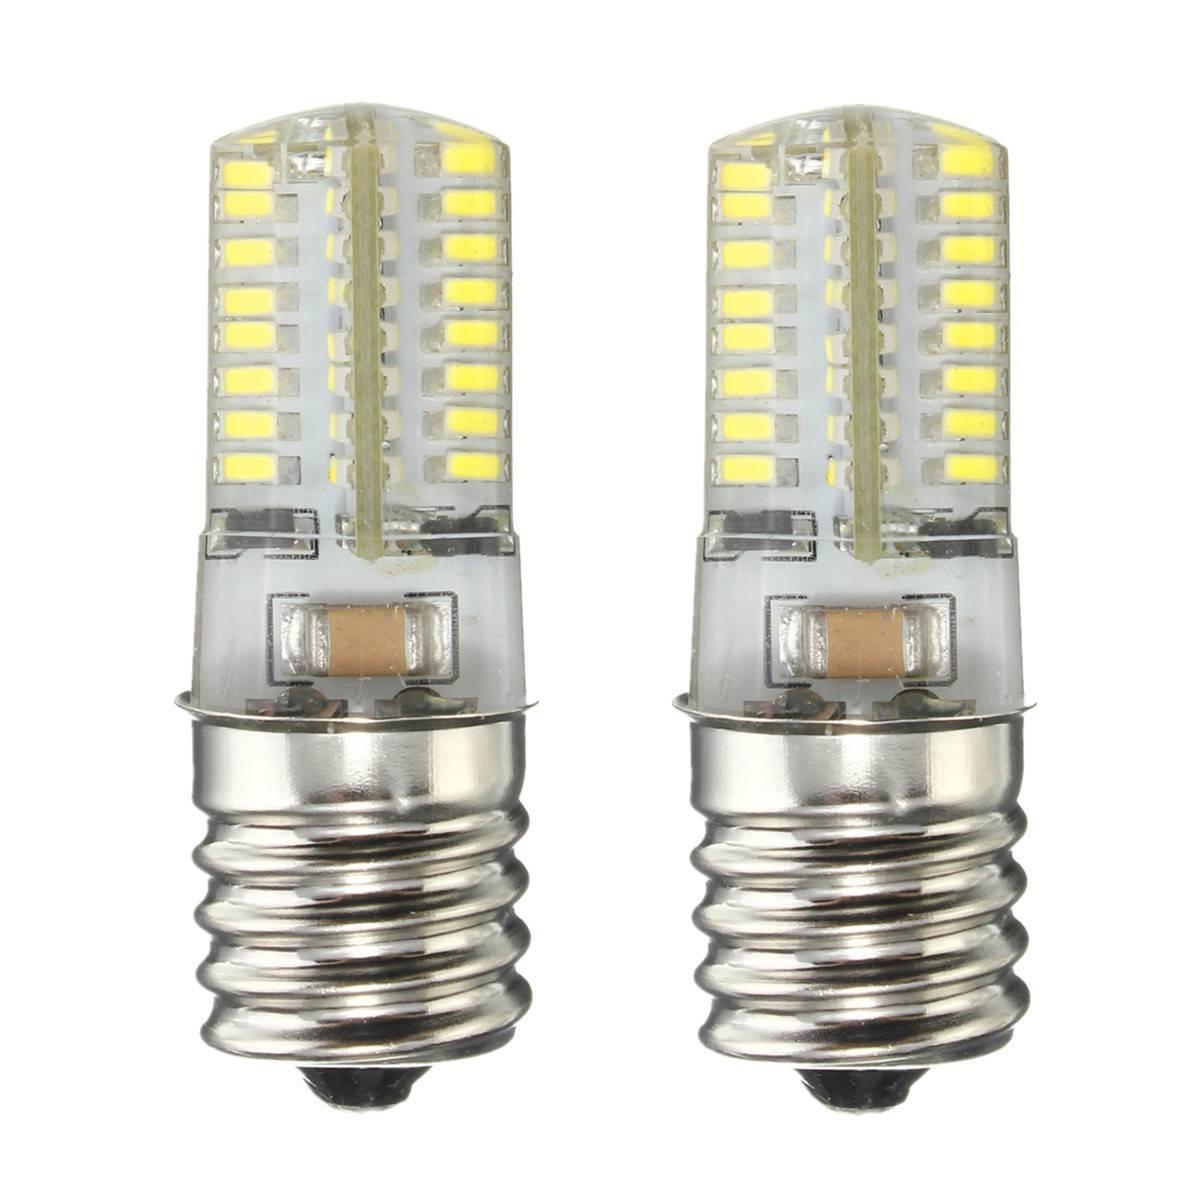 Kingso E17 Microwave Appliance Refrigerator Led Light Bulb 4w Intermediate F